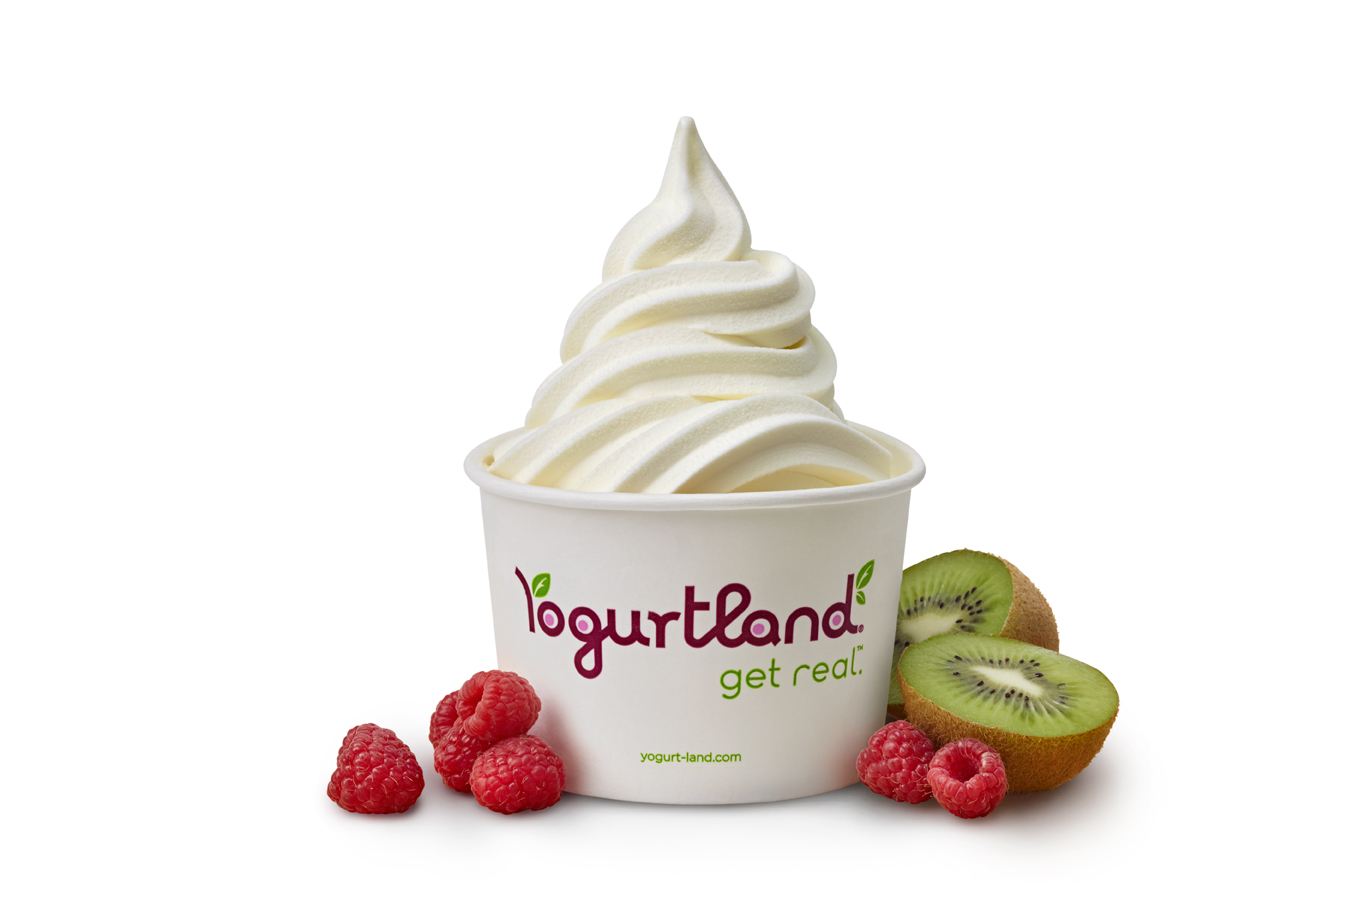 yogurtland blogs what 39 s your flavor. Black Bedroom Furniture Sets. Home Design Ideas